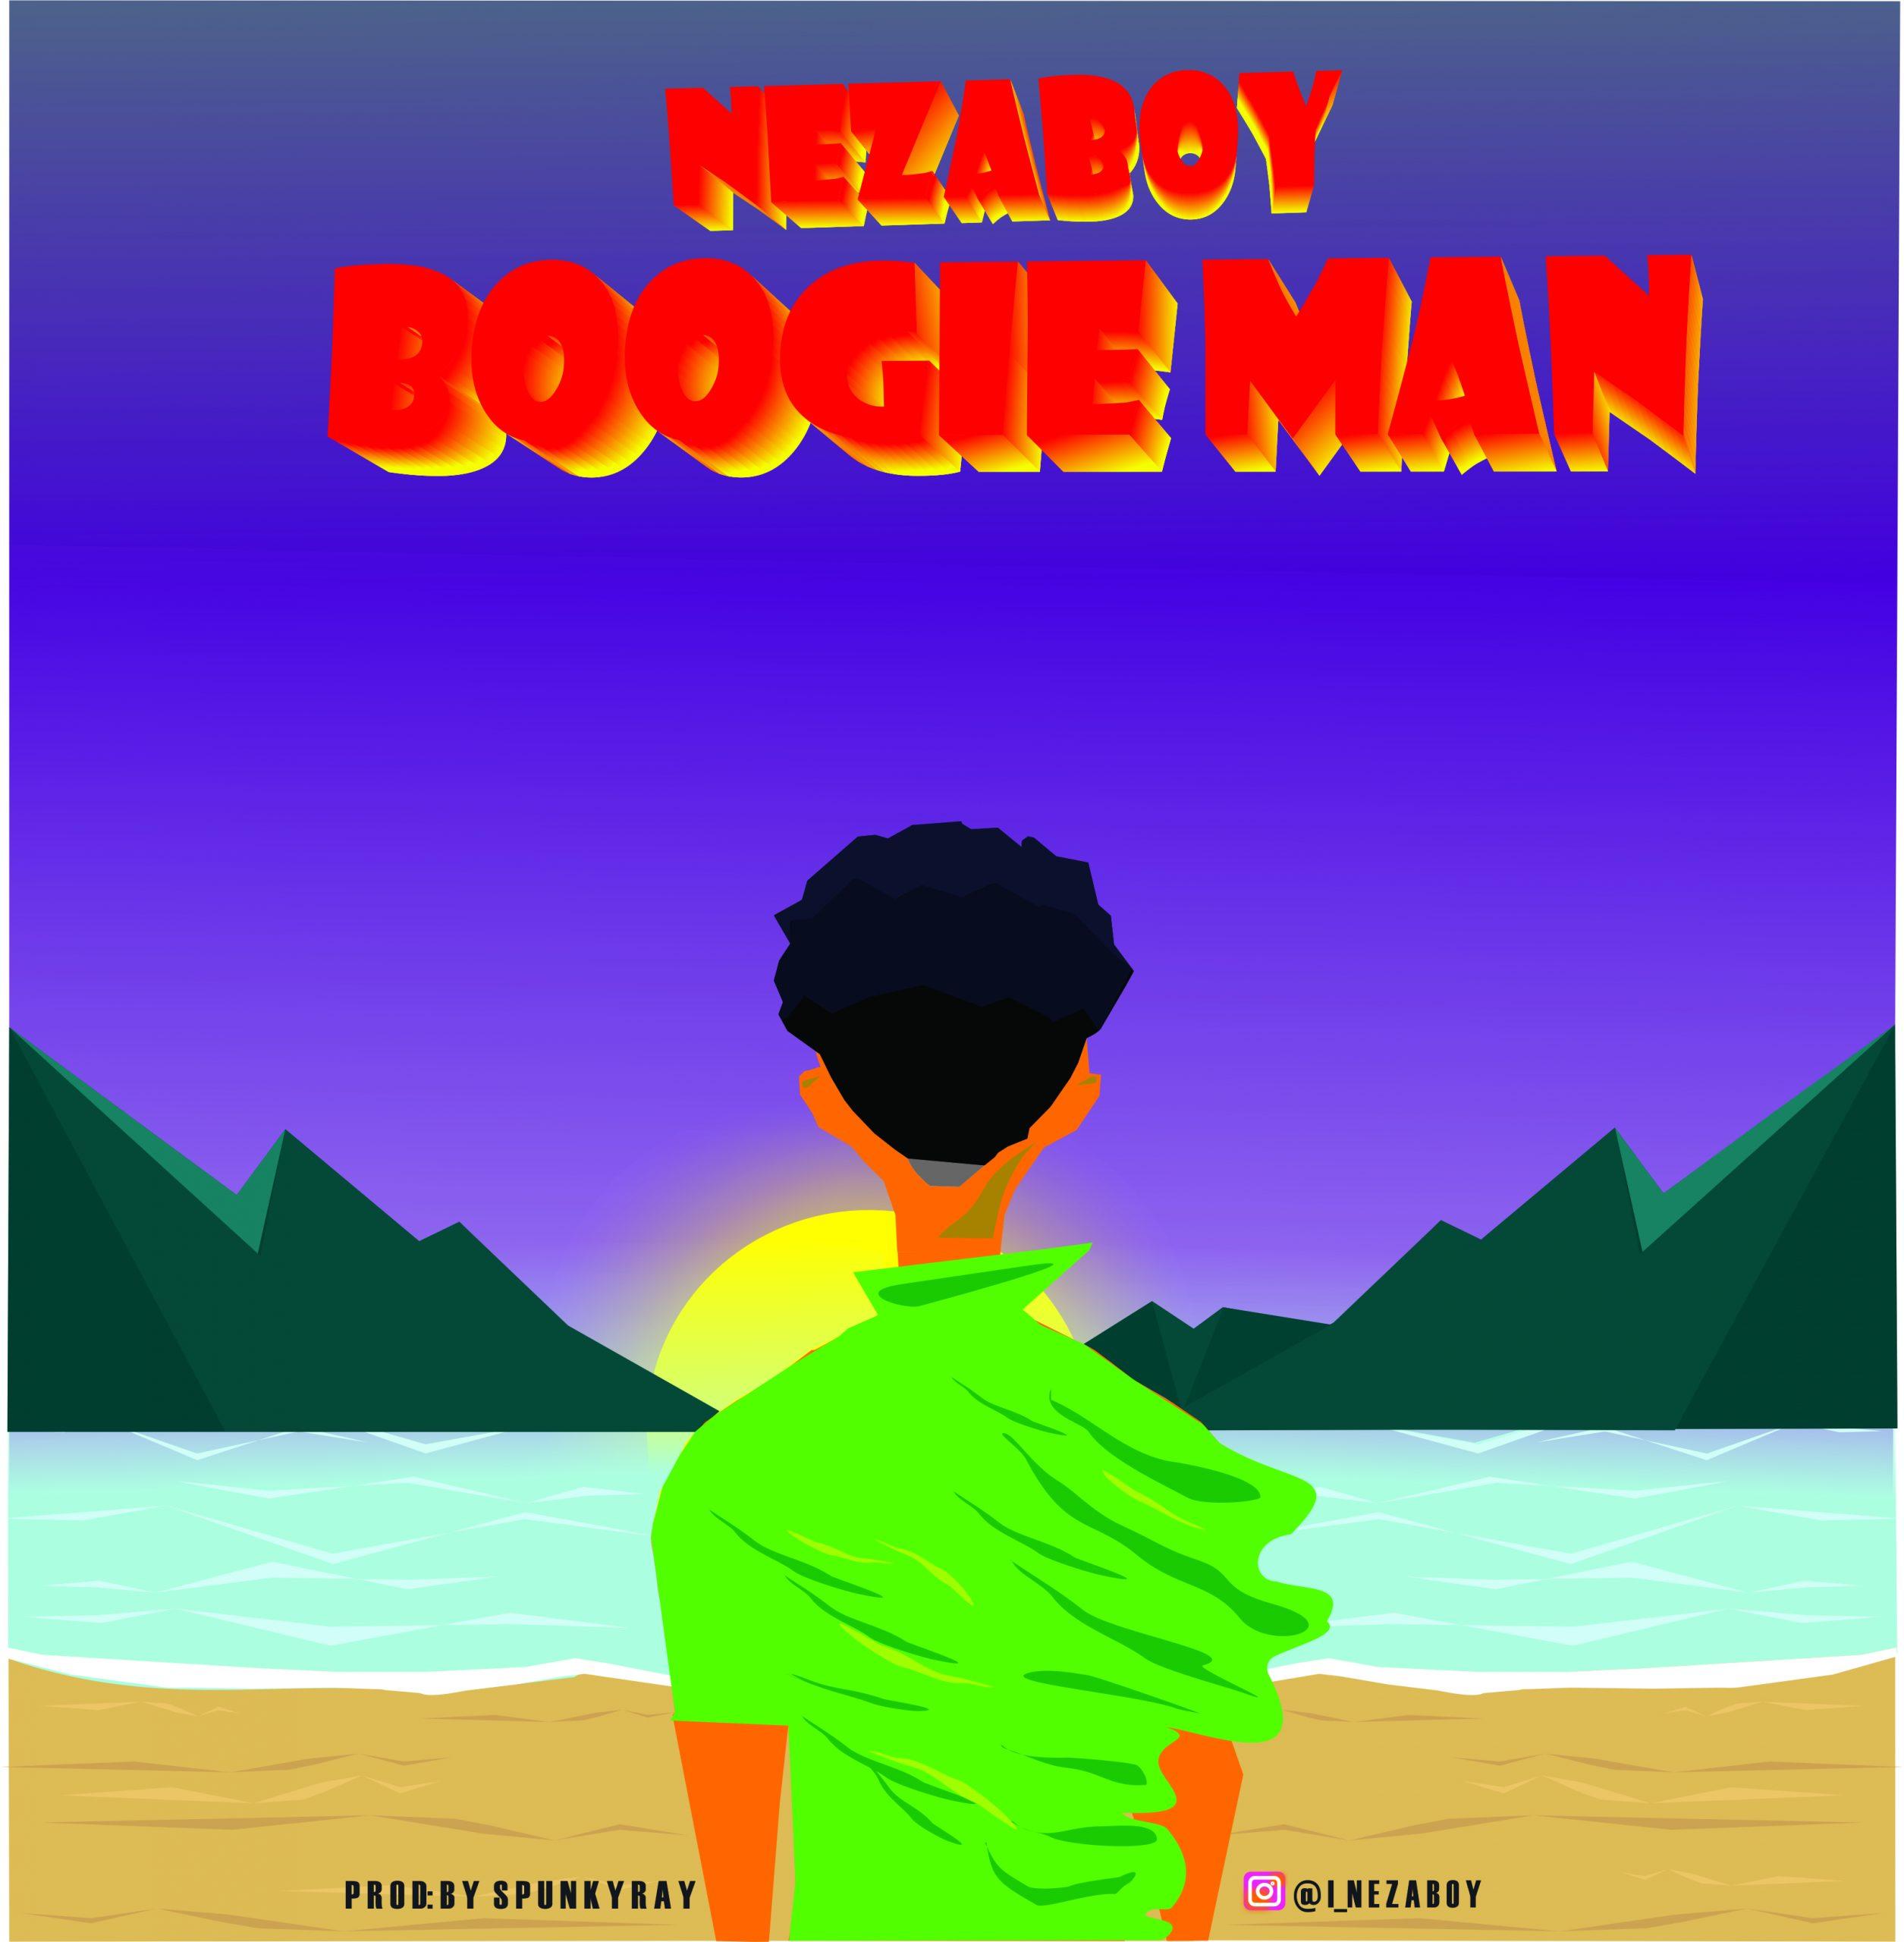 Nezaboy - Boogie Man